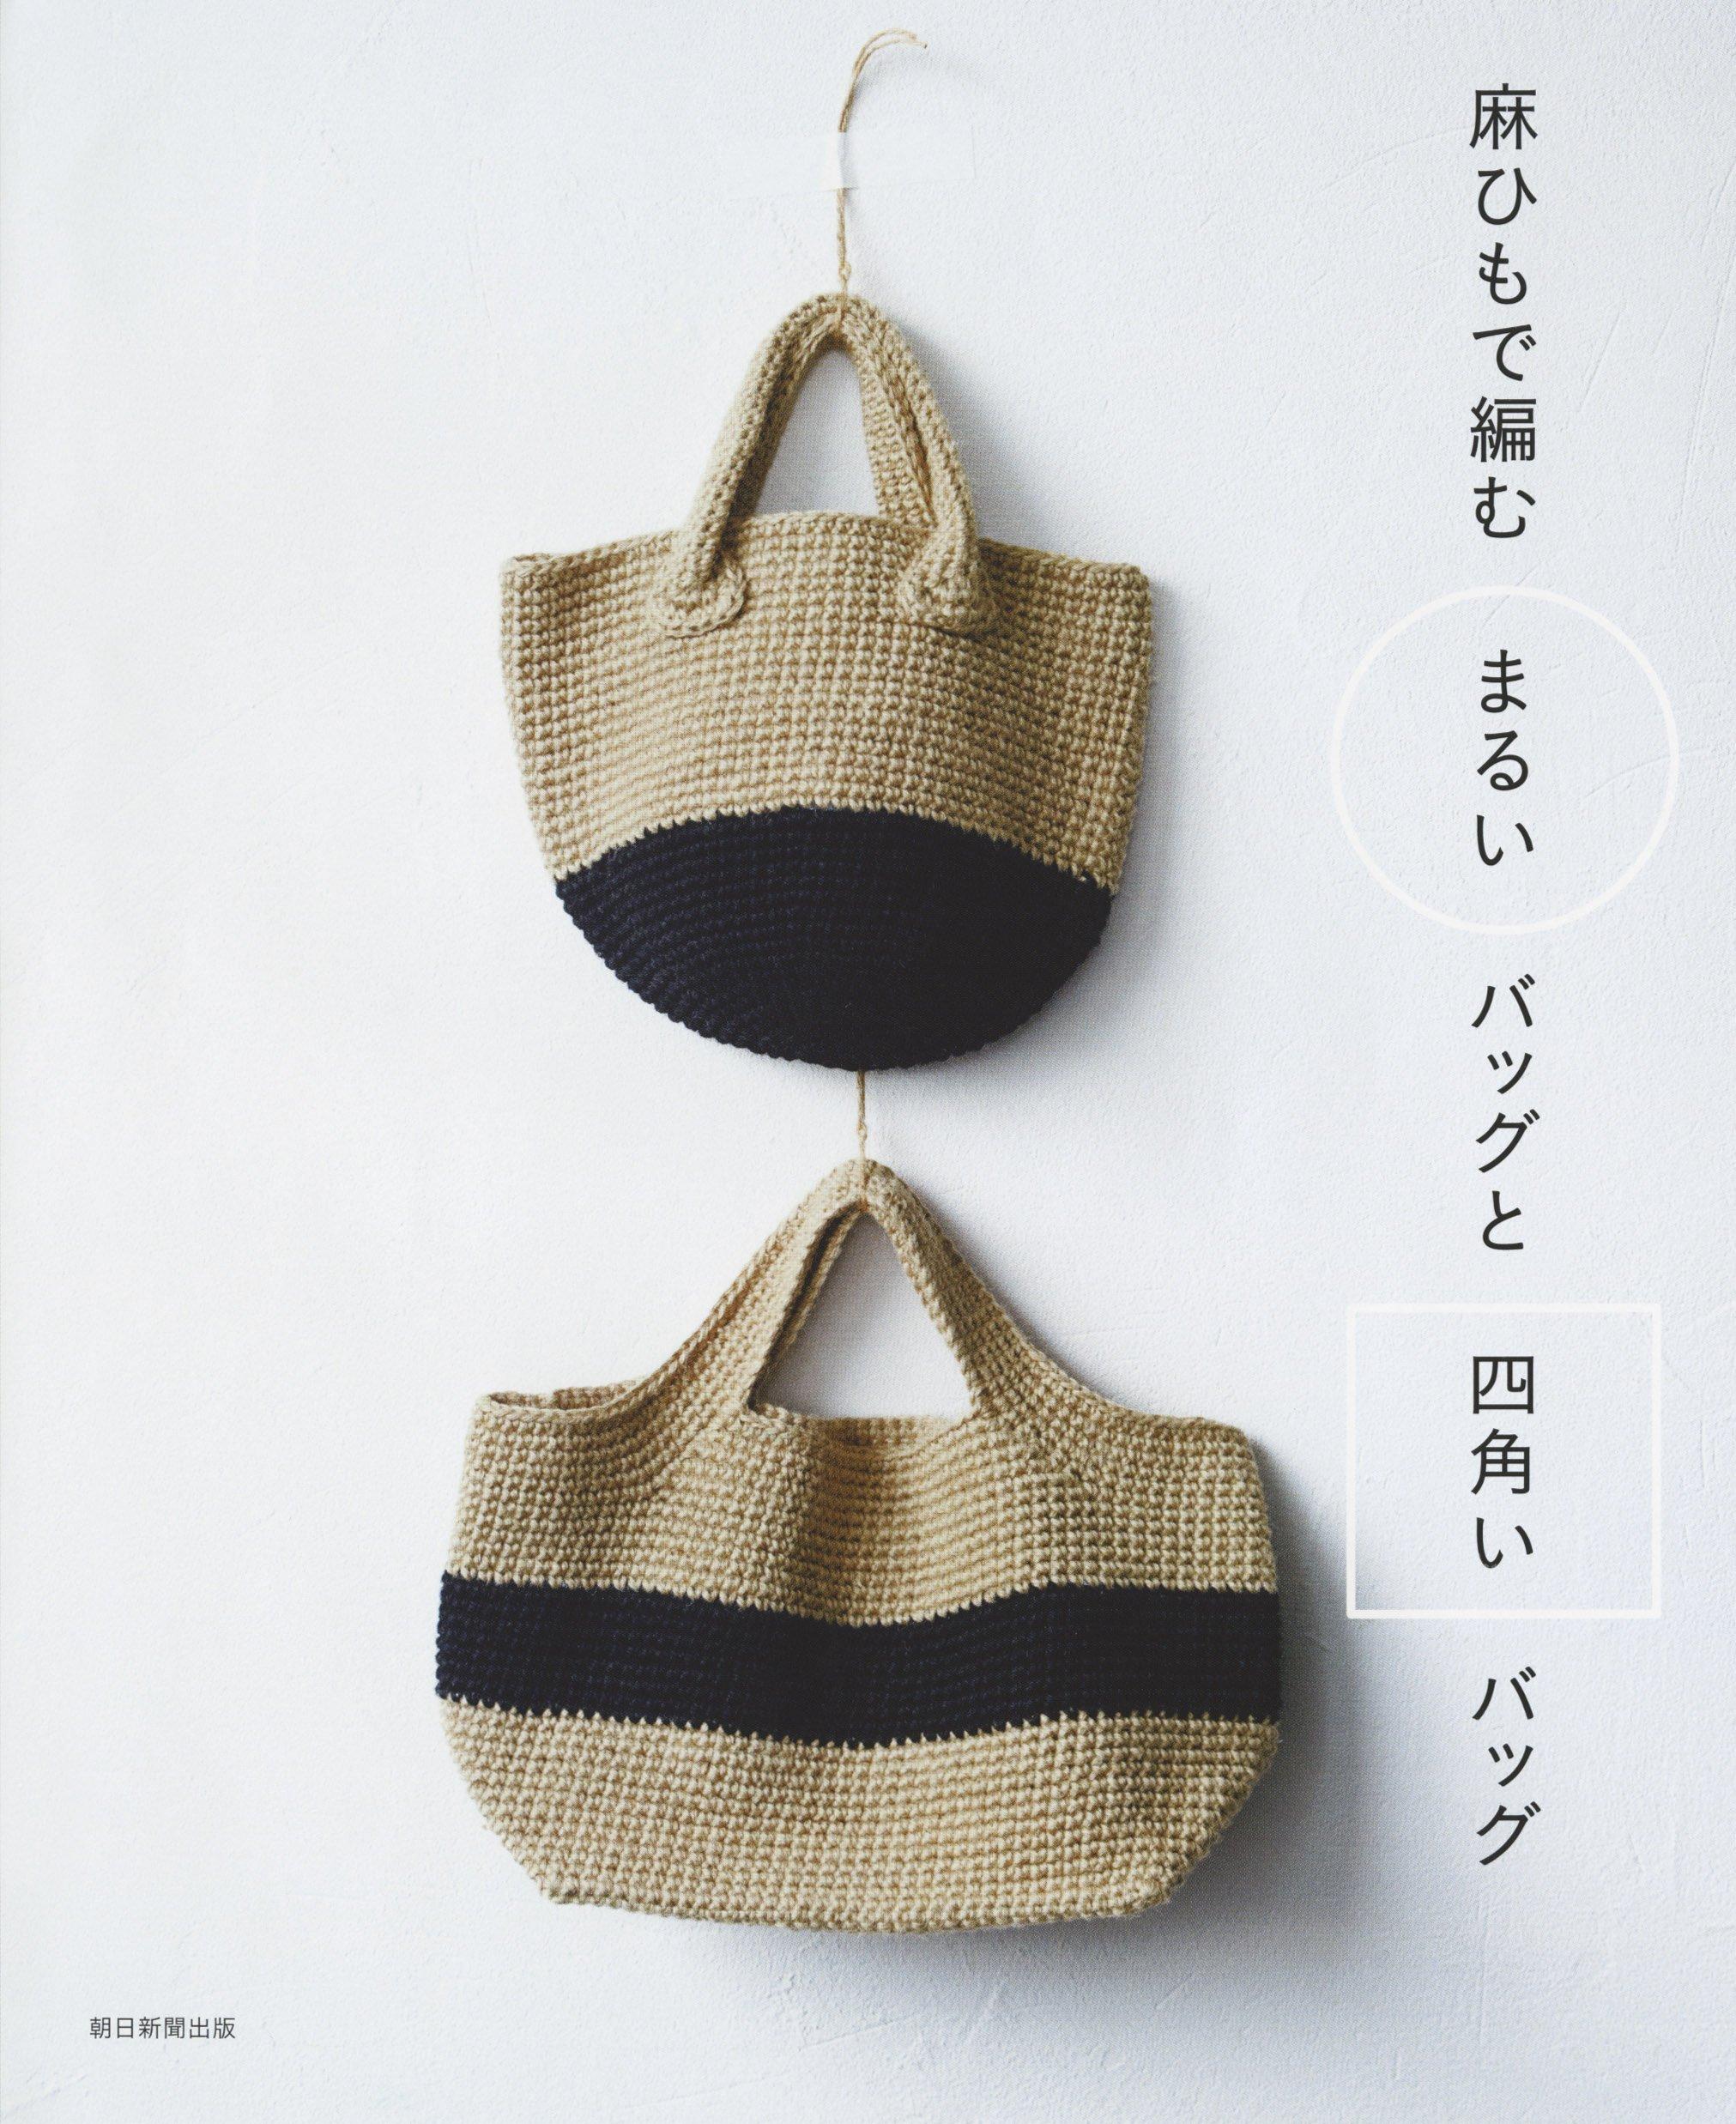 Round & square bag knitting with hemp